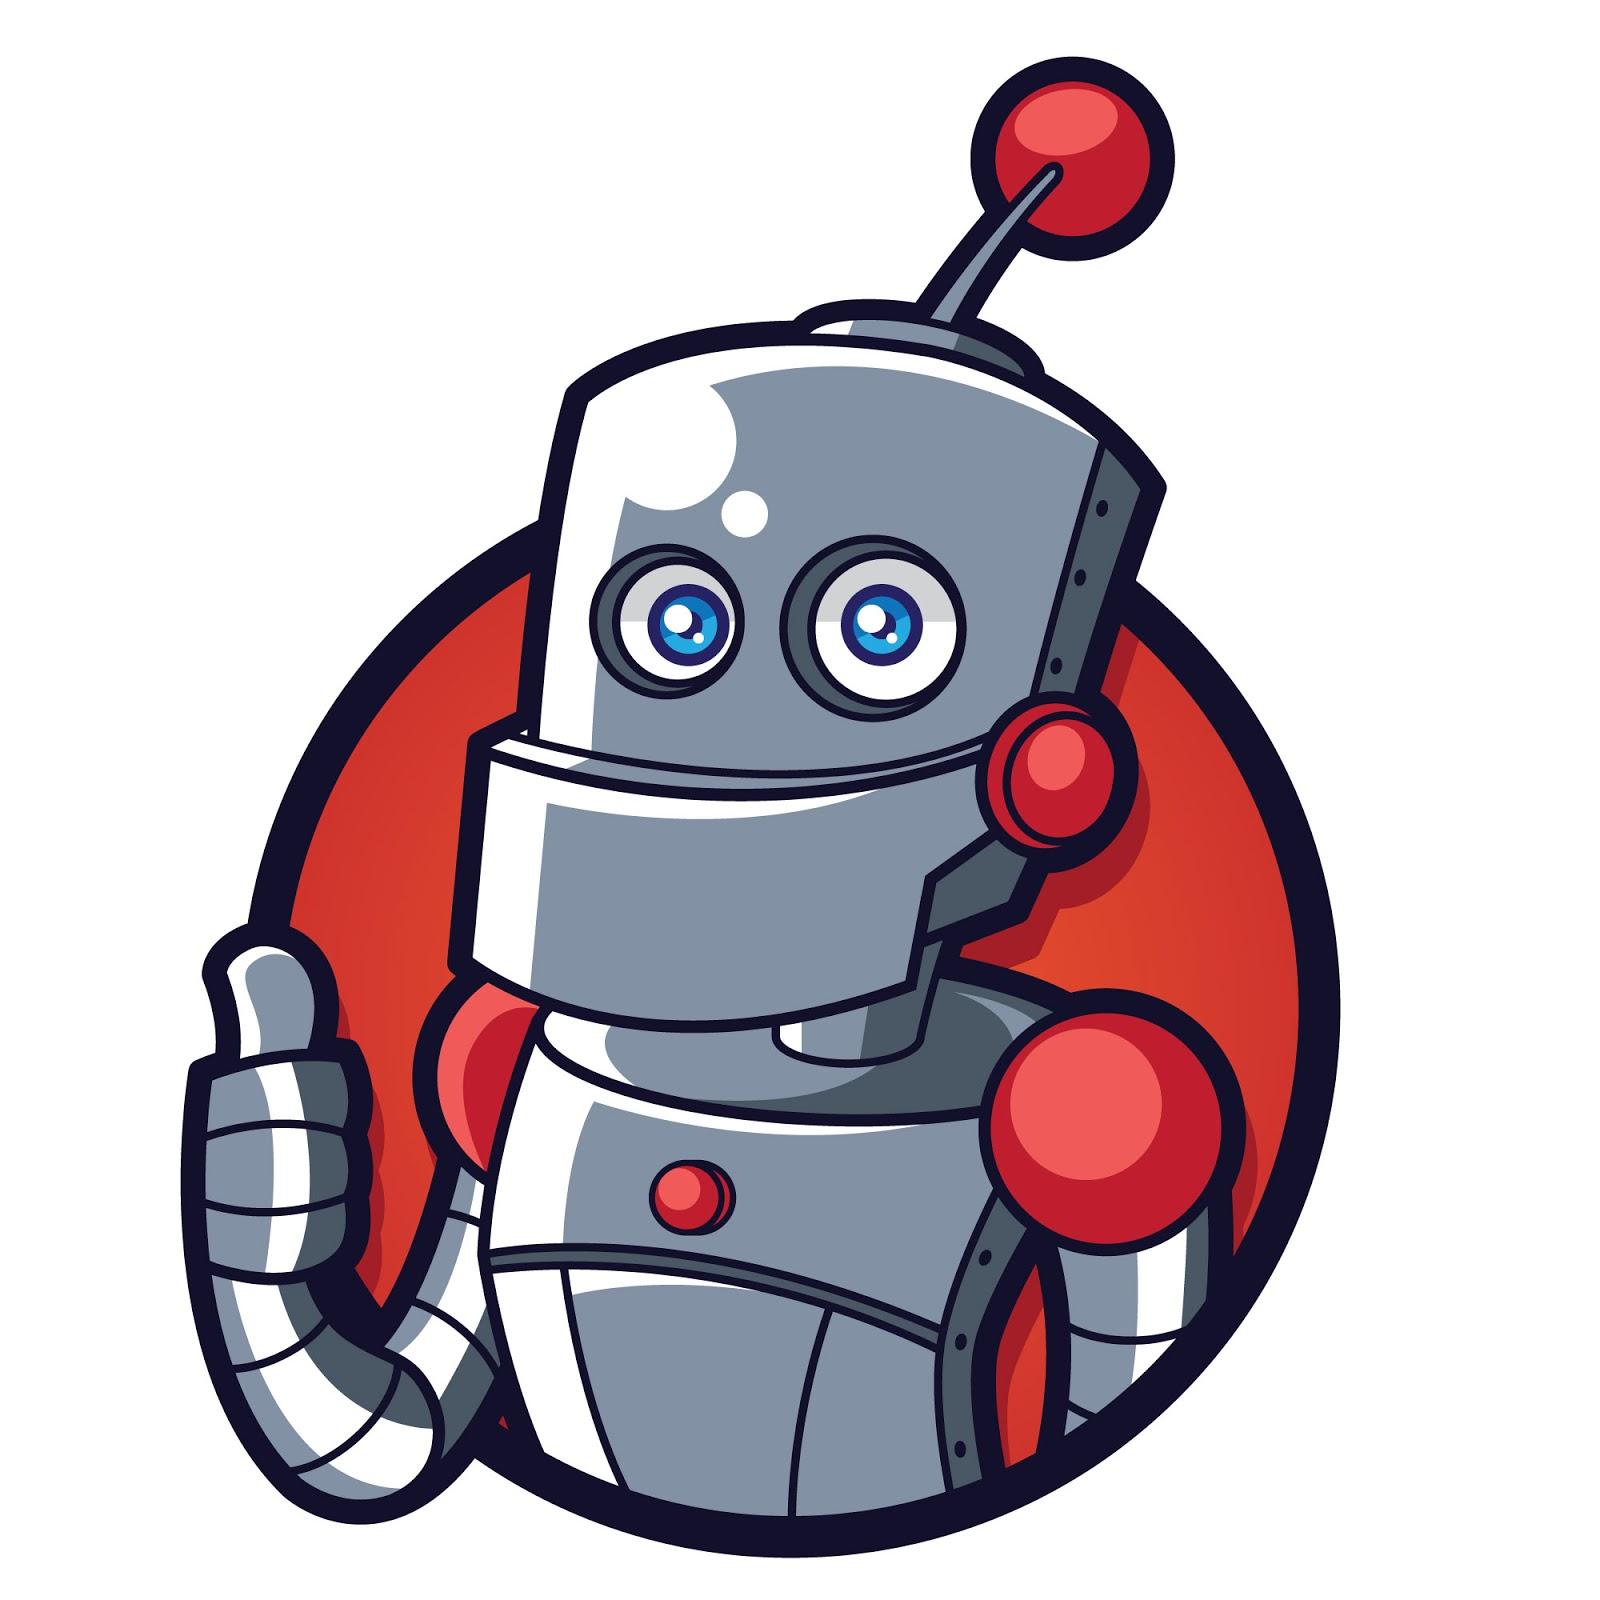 Robo Mascot Logo Free Download Vector CDR, AI, EPS and PNG Formats